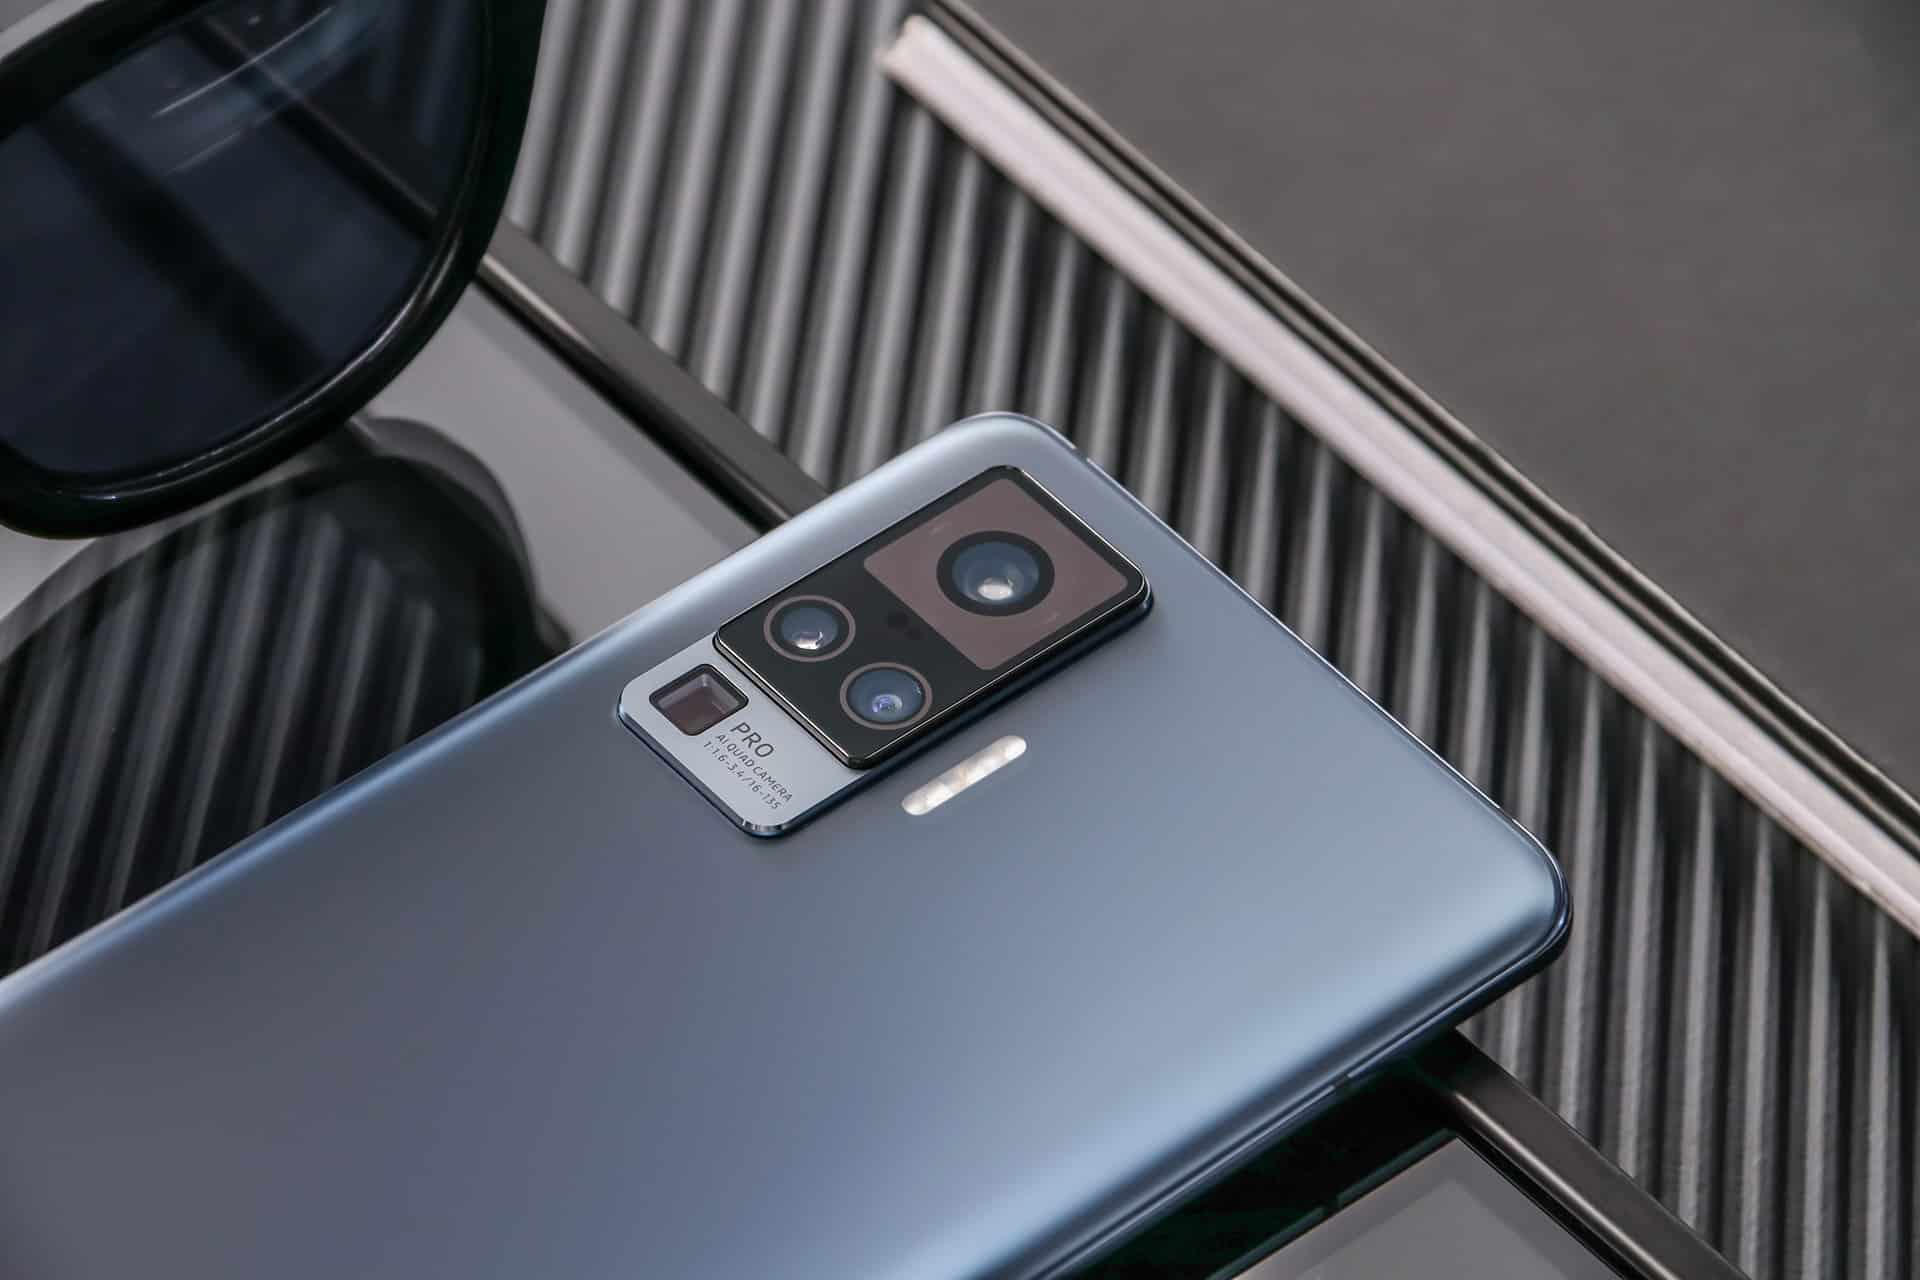 vivo X51 appareil photo gimbal